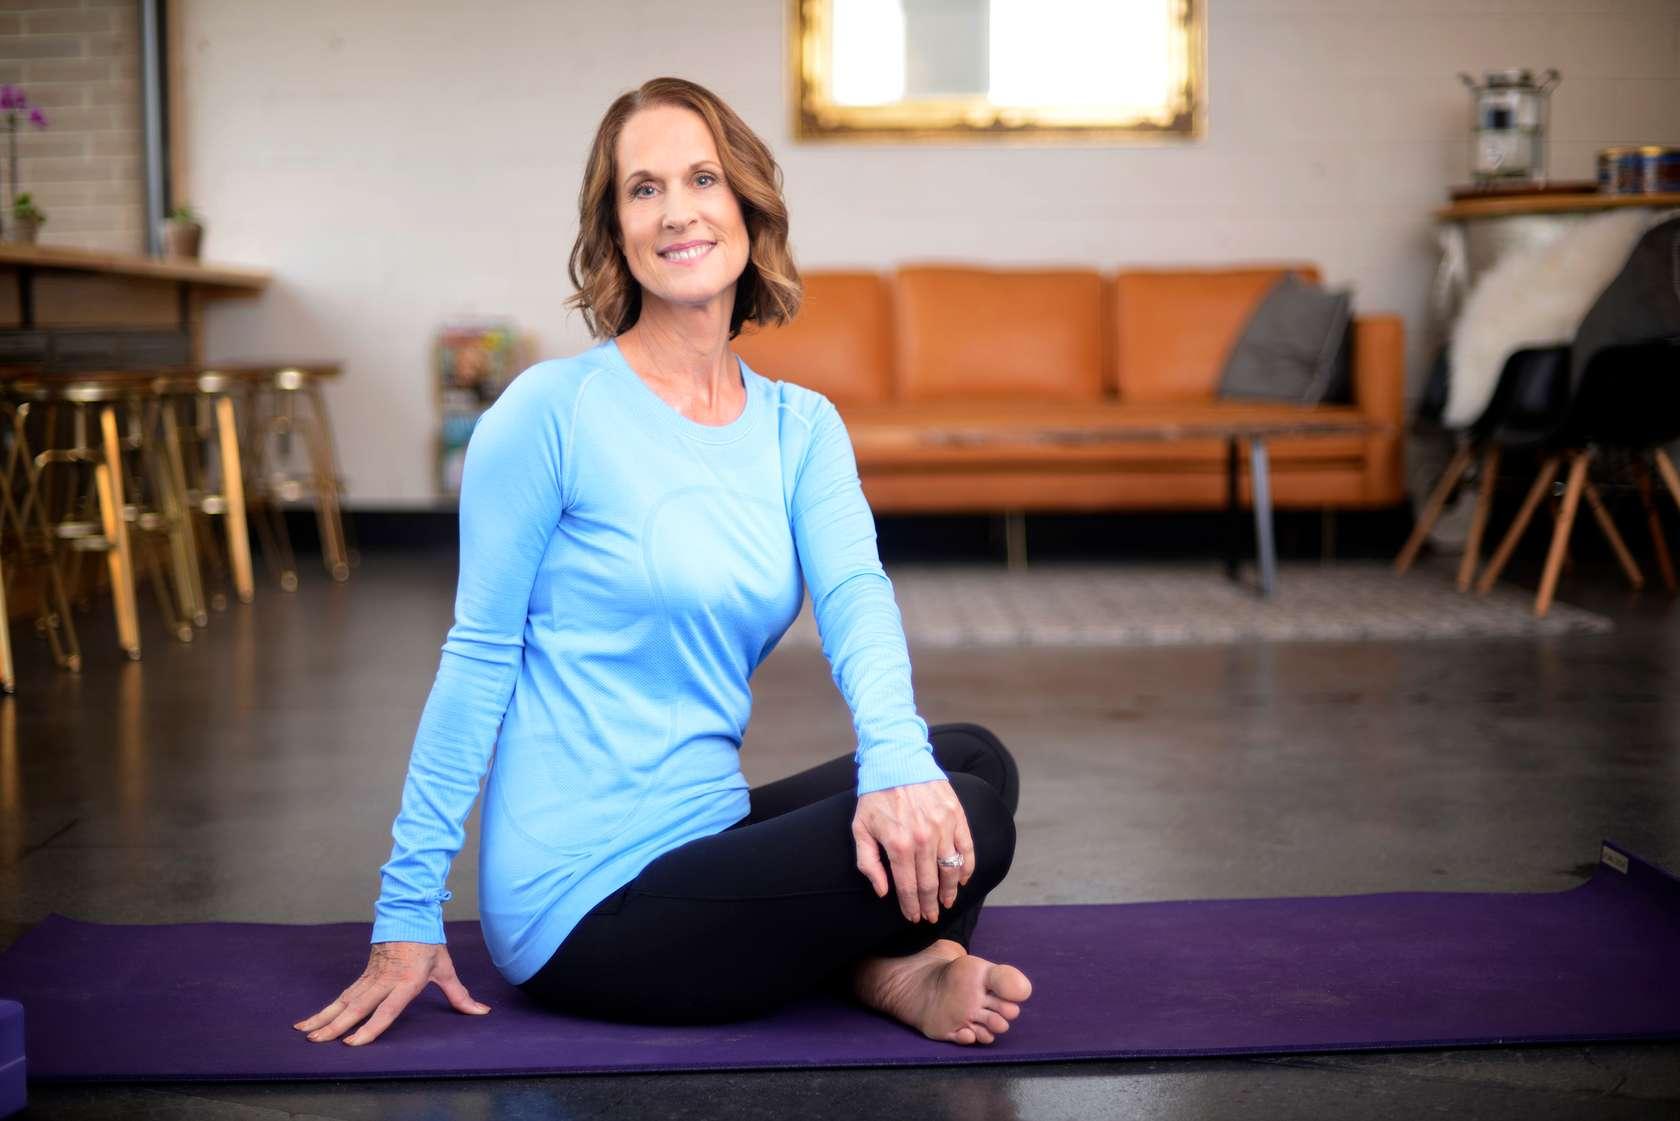 yoga72.jpg